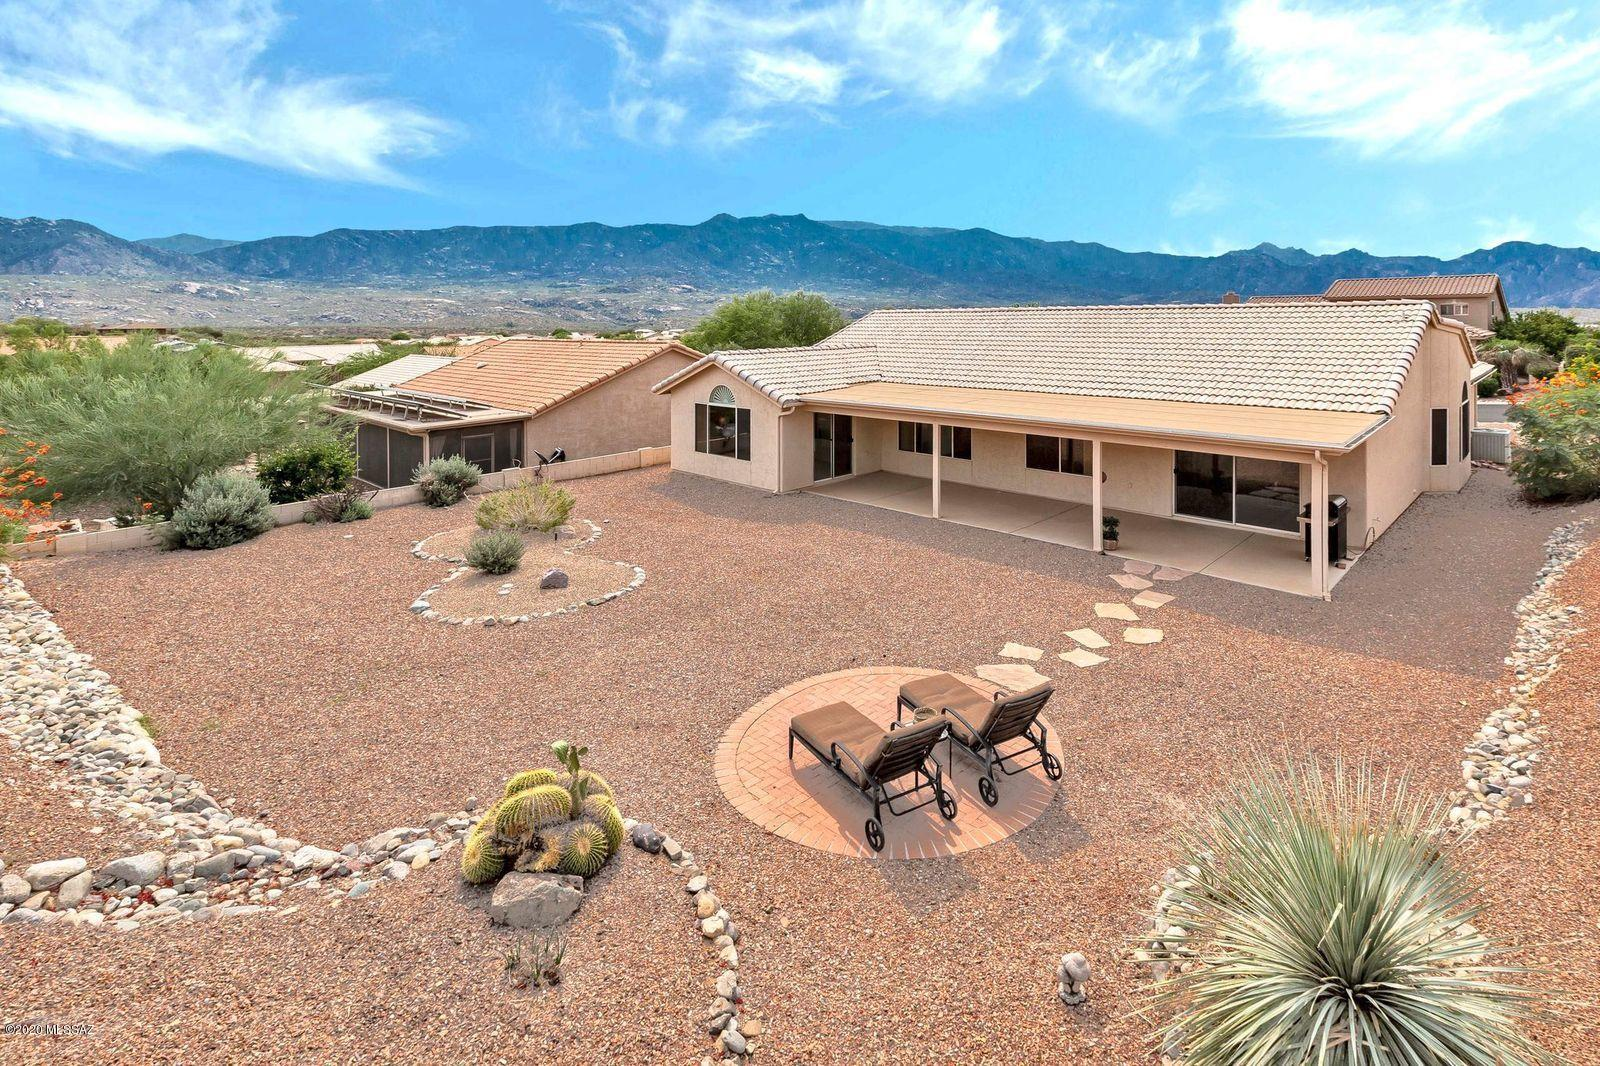 Photo of 63412 E Desert Crest Drive, Saddlebrooke, AZ 85739